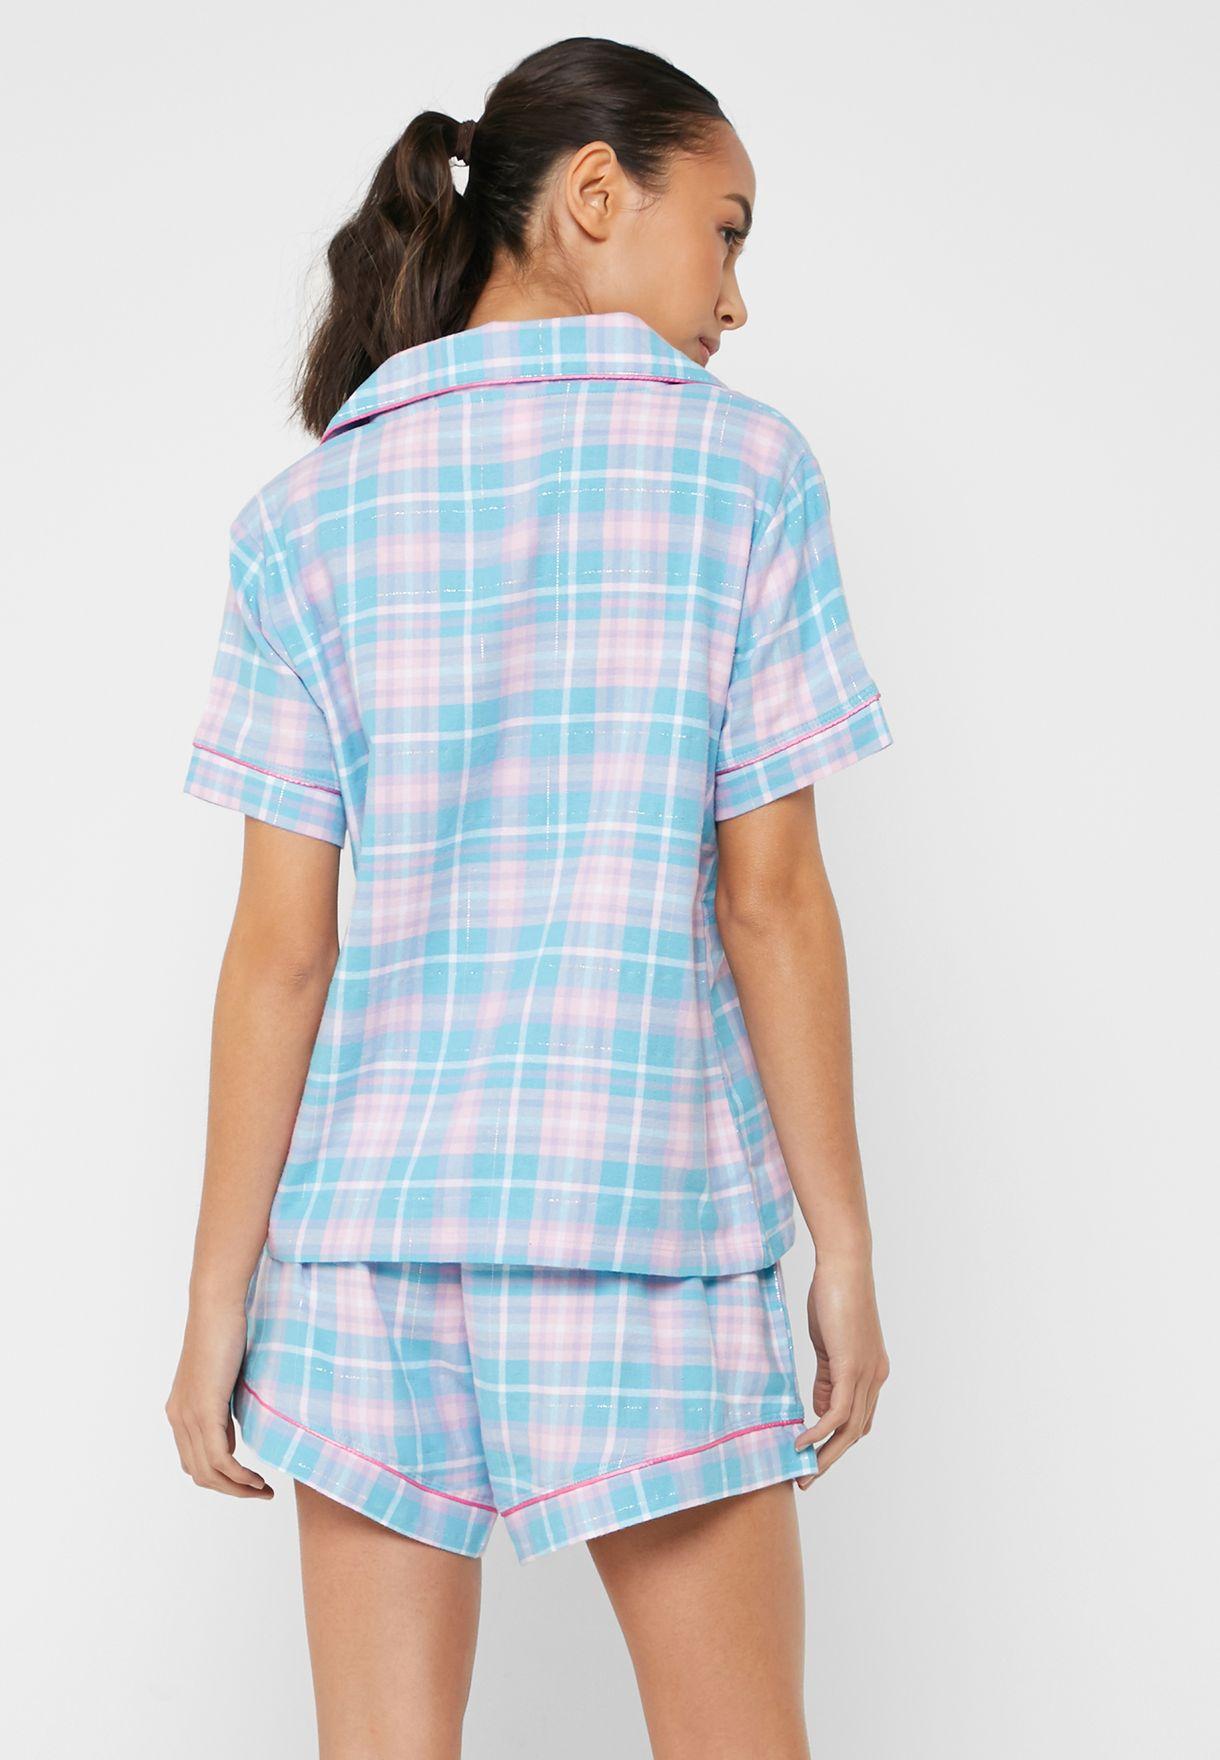 طقم (قميص + شورت) بطبعات مربعات